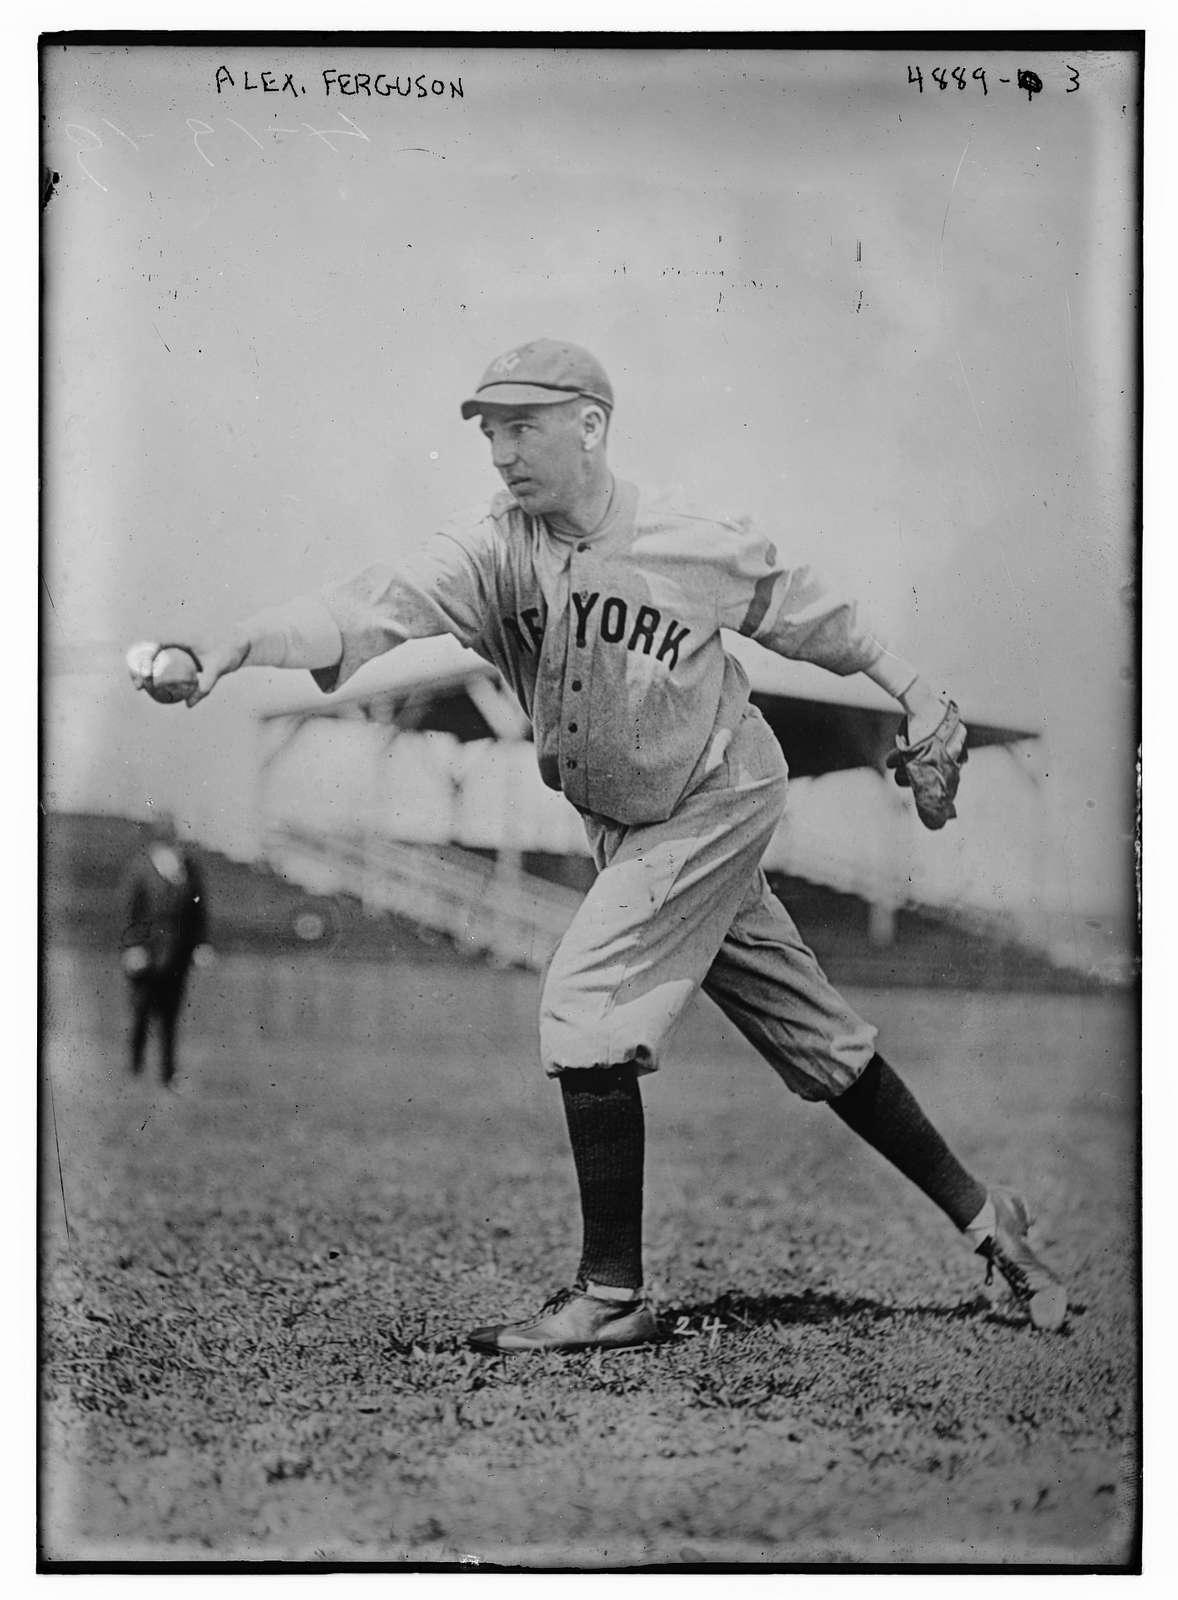 Alex Ferguson, New York AL (baseball)